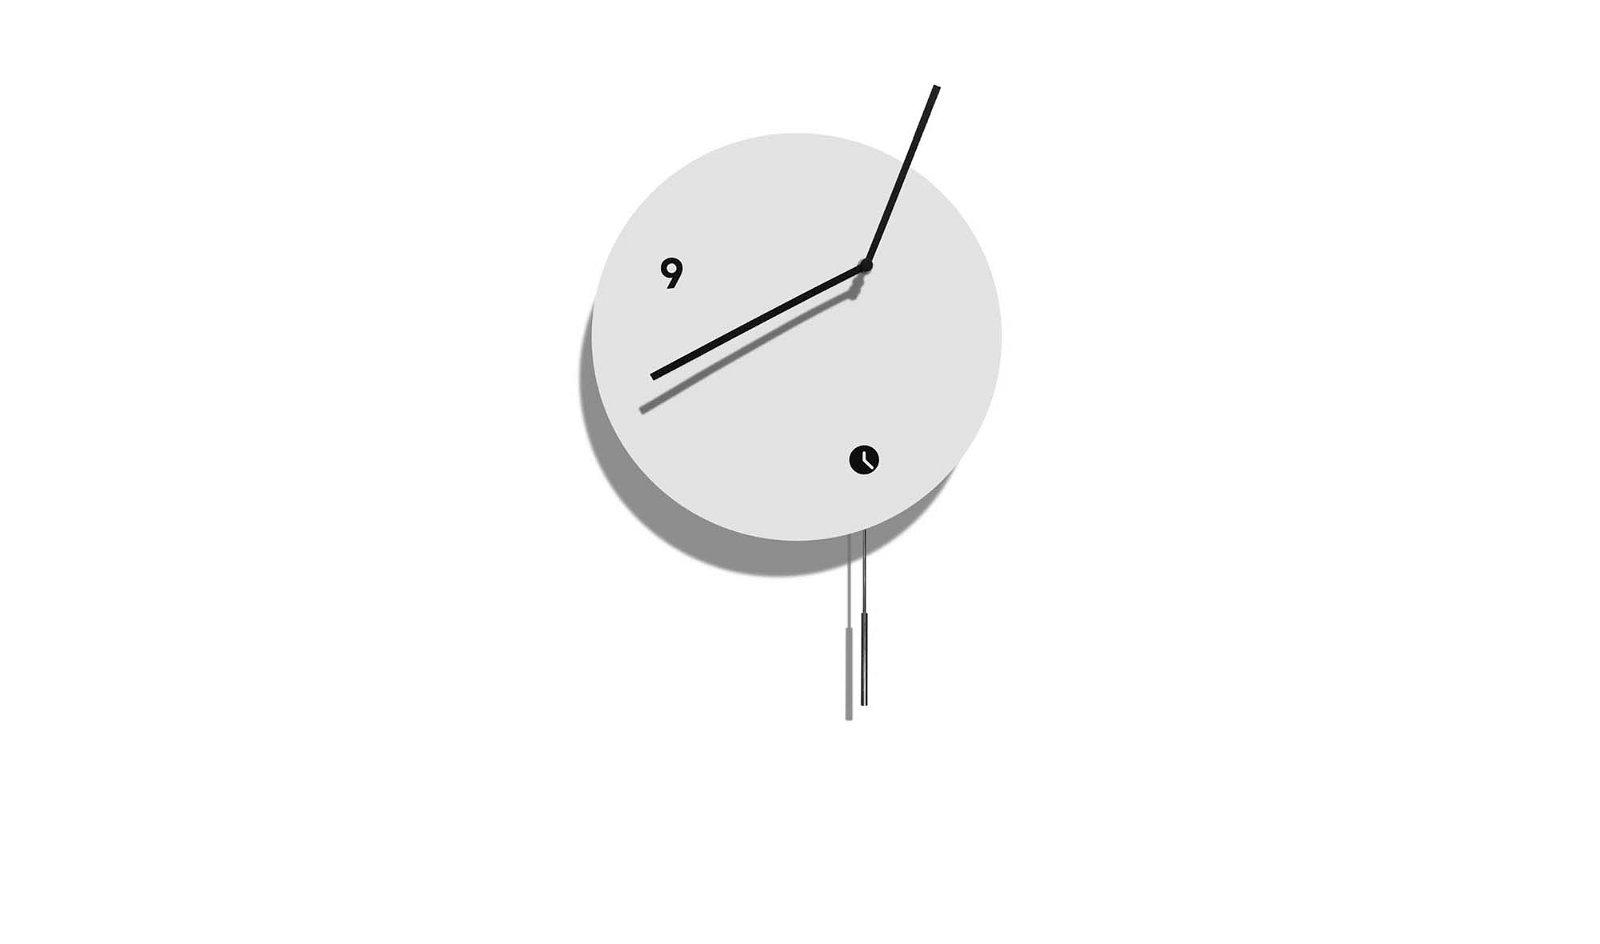 Reloj Globus by Tothora